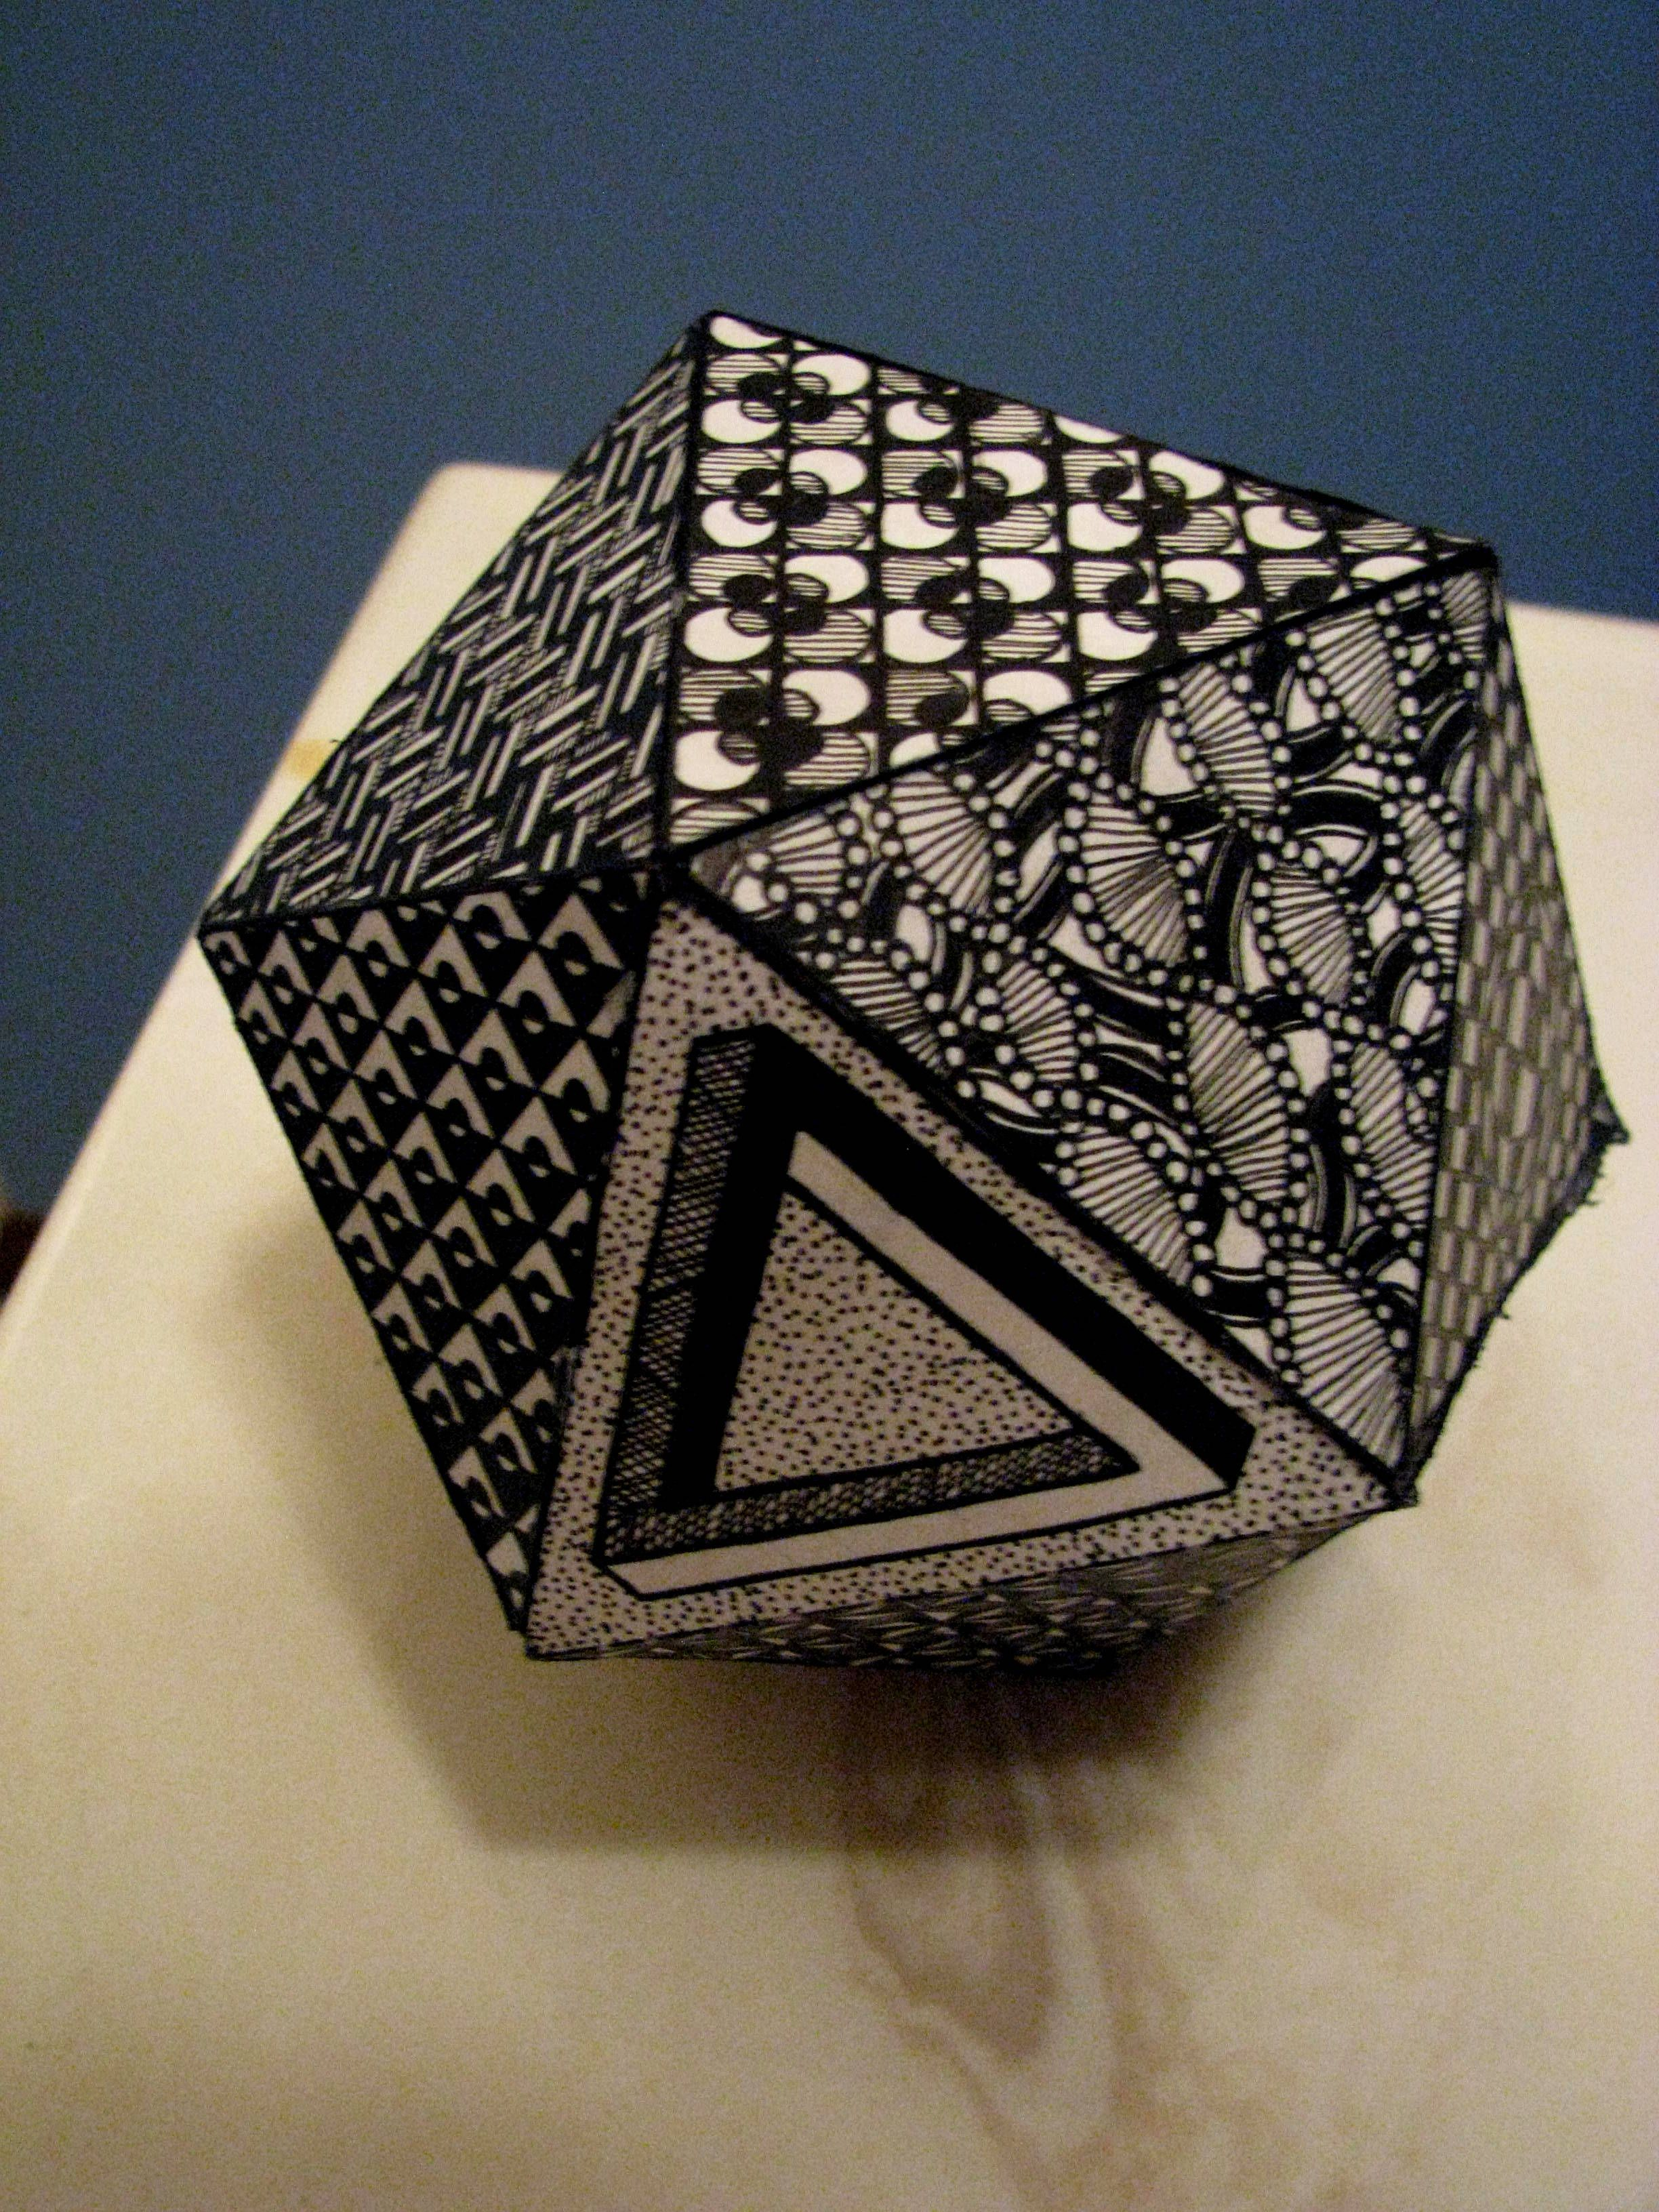 A tangled Icosahedron (20 sided polygon paper shape) | TARA\'S ...